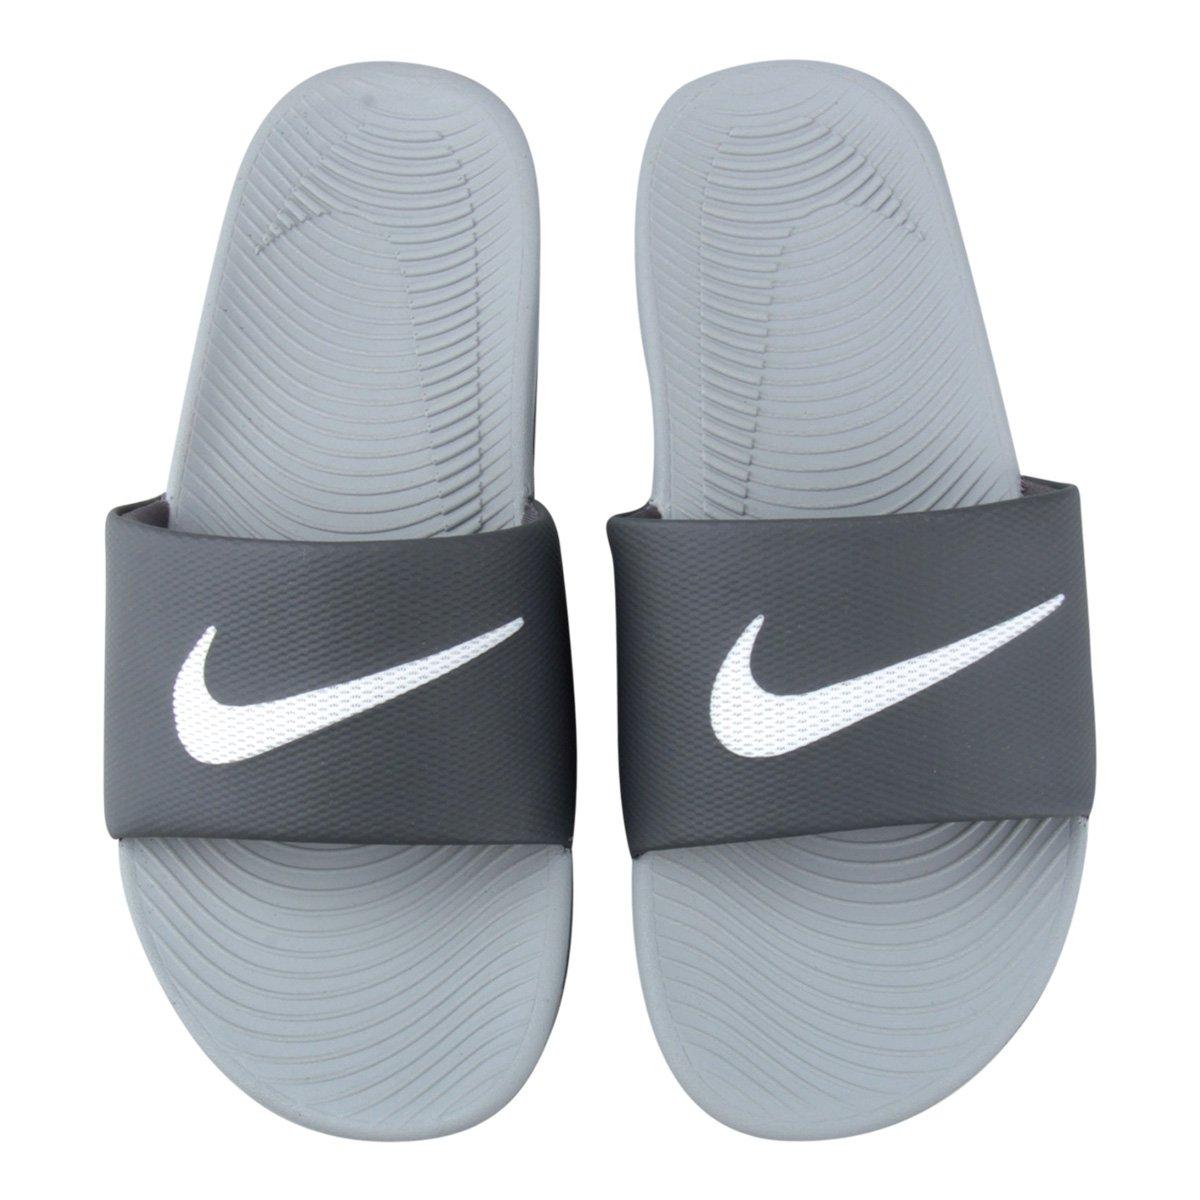 dfa0a9a1f8 Sandália Nike Kawa Slide Masculina - Branco e Cinza - Compre Agora ...